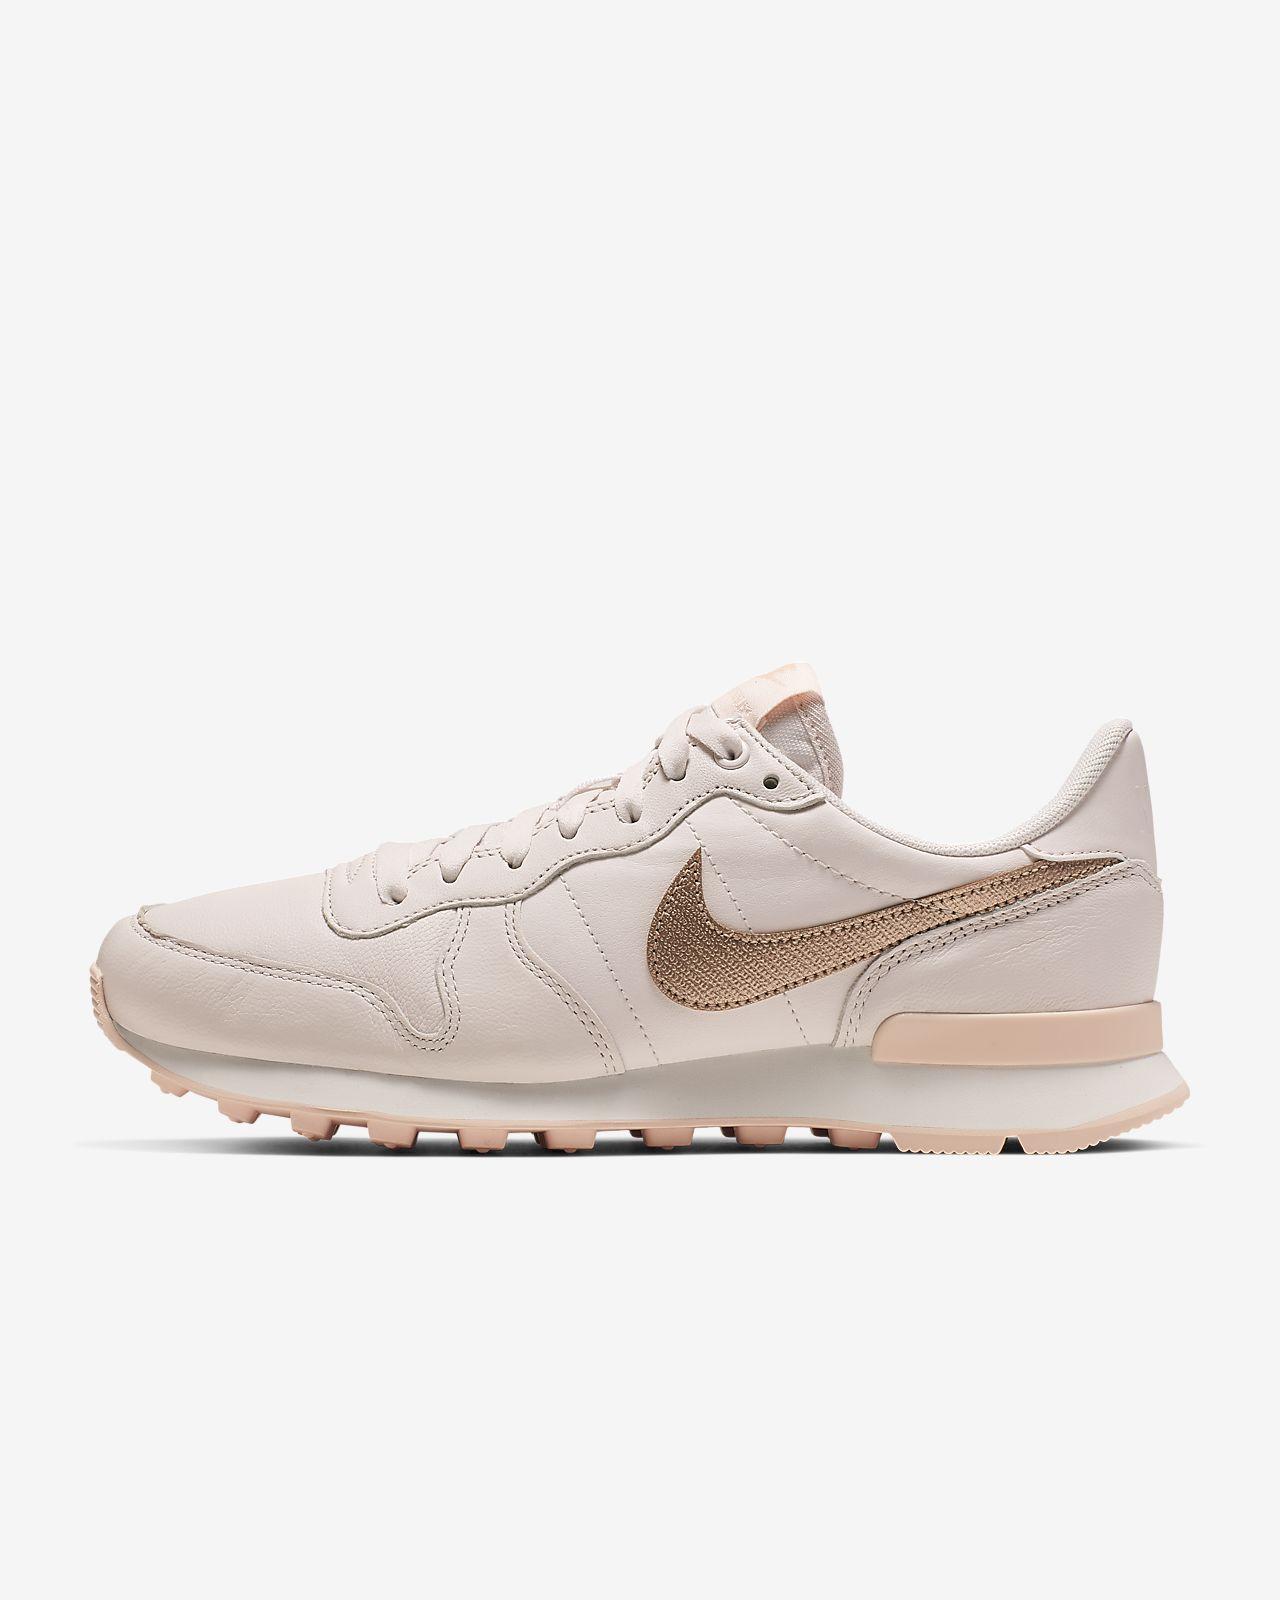 538a2fb665f3 Low Resolution Buty damskie Nike Internationalist Premium Buty damskie Nike  Internationalist Premium